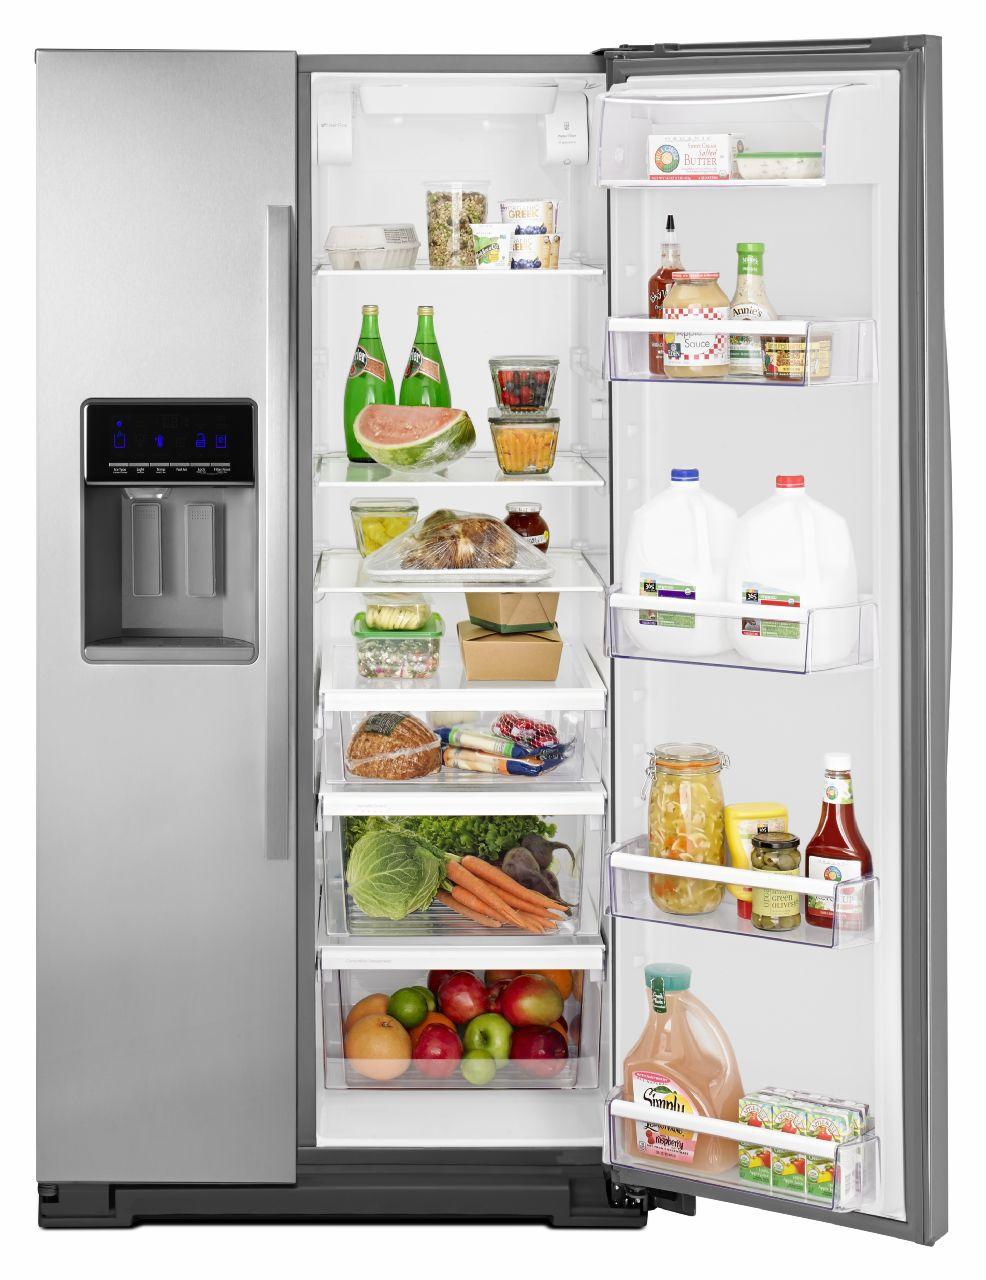 Whirlpool counter side by side refrigerator wrs571cidm 5 rubansaba